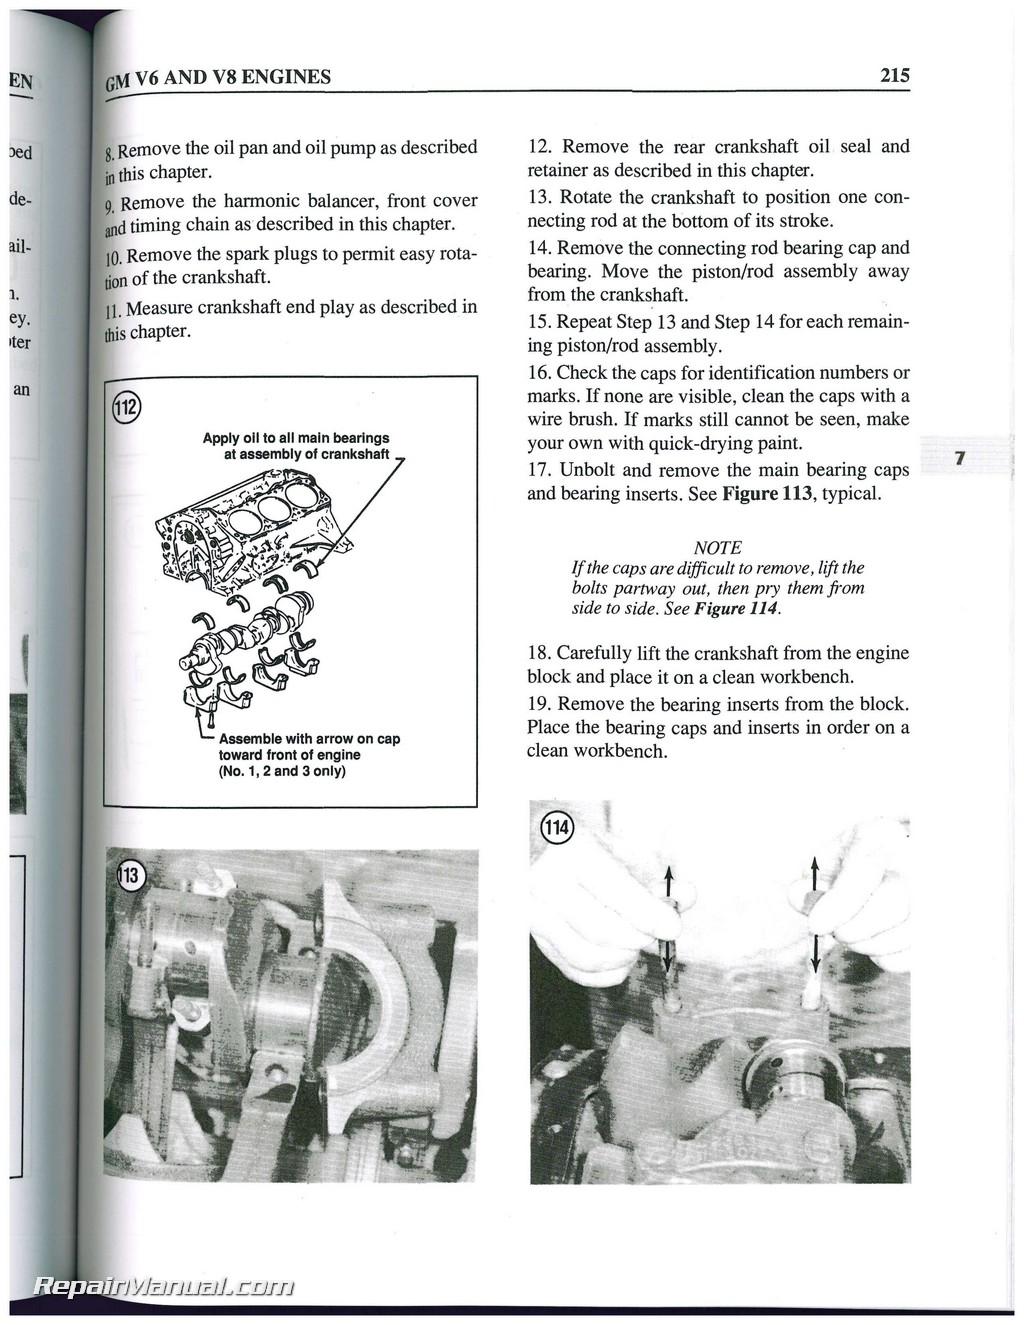 yamaha stern drive 1989 1990 1991 clymer boat engine repair manual rh repairmanual com marine engine parts manual marine engine repair manual pdf